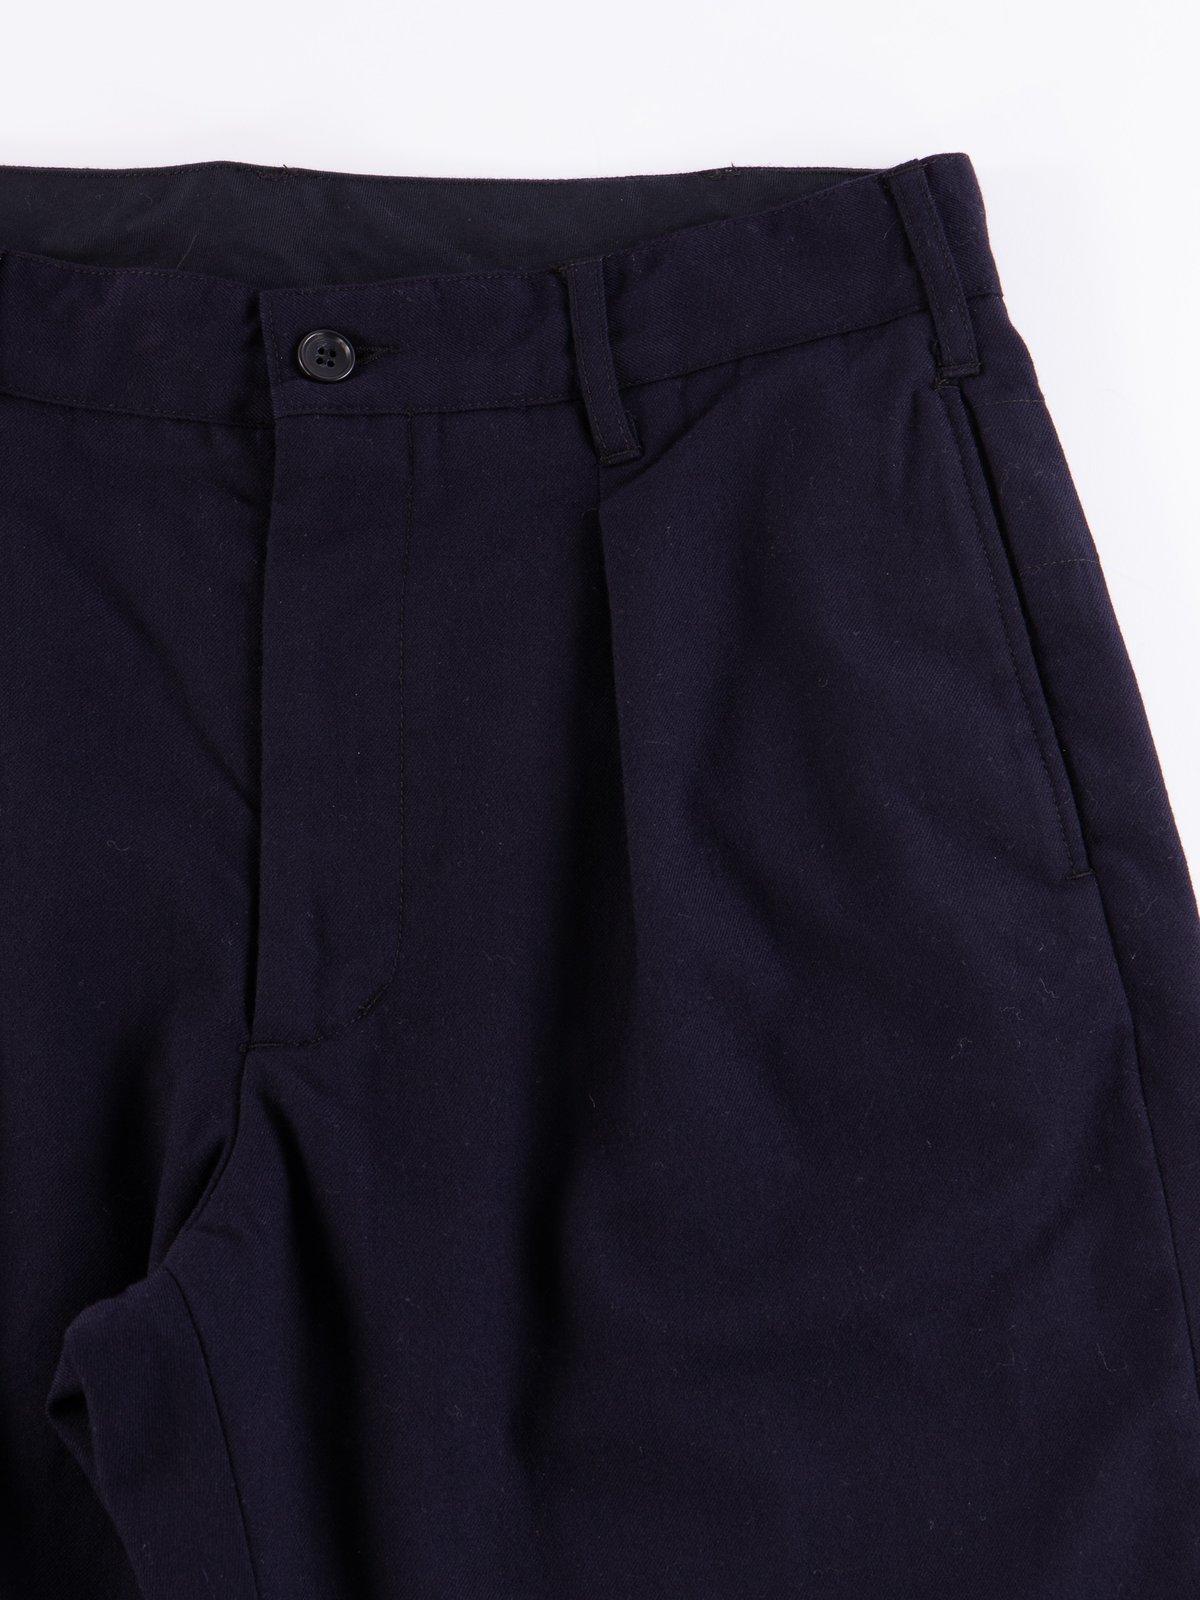 Dark Navy Wool Uniform Serge Carlyle Pant - Image 3